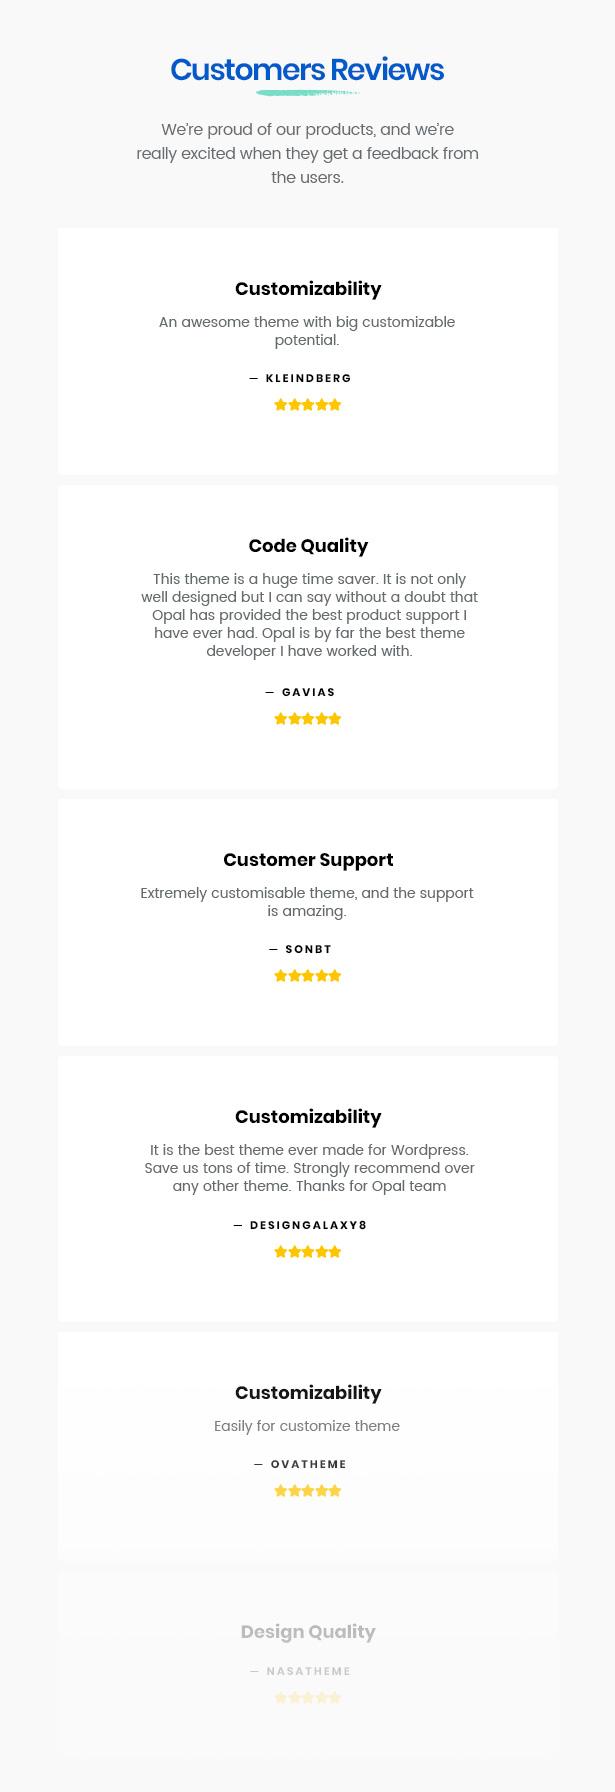 ezBoozt – All-in-one WooCommerce WordPress Theme   Prosyscom Tech 5